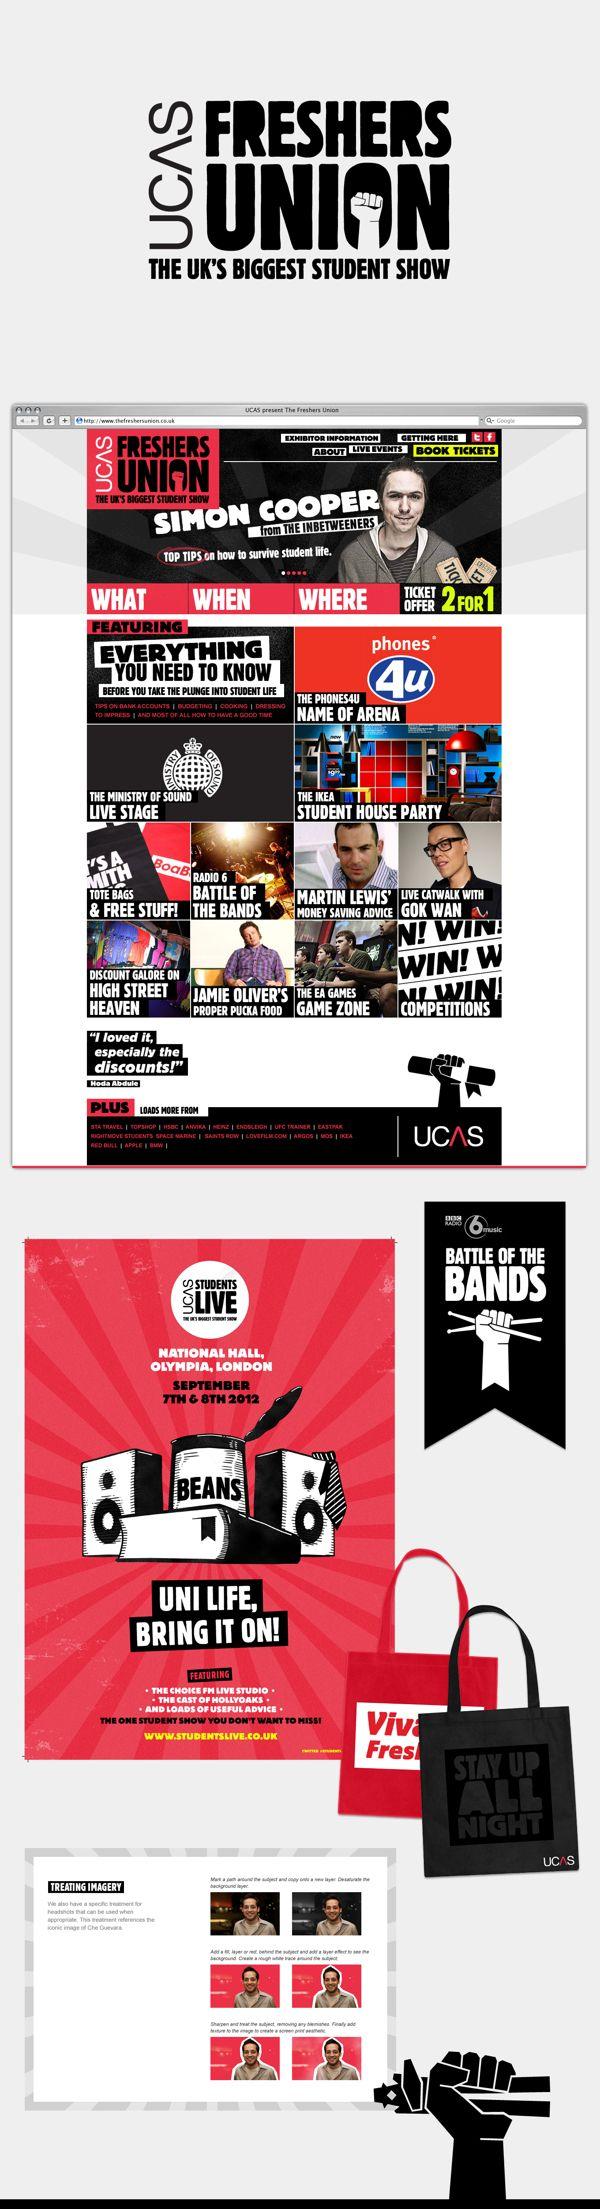 UCAS Freshers Union branding & website design by Rich French, via Behance